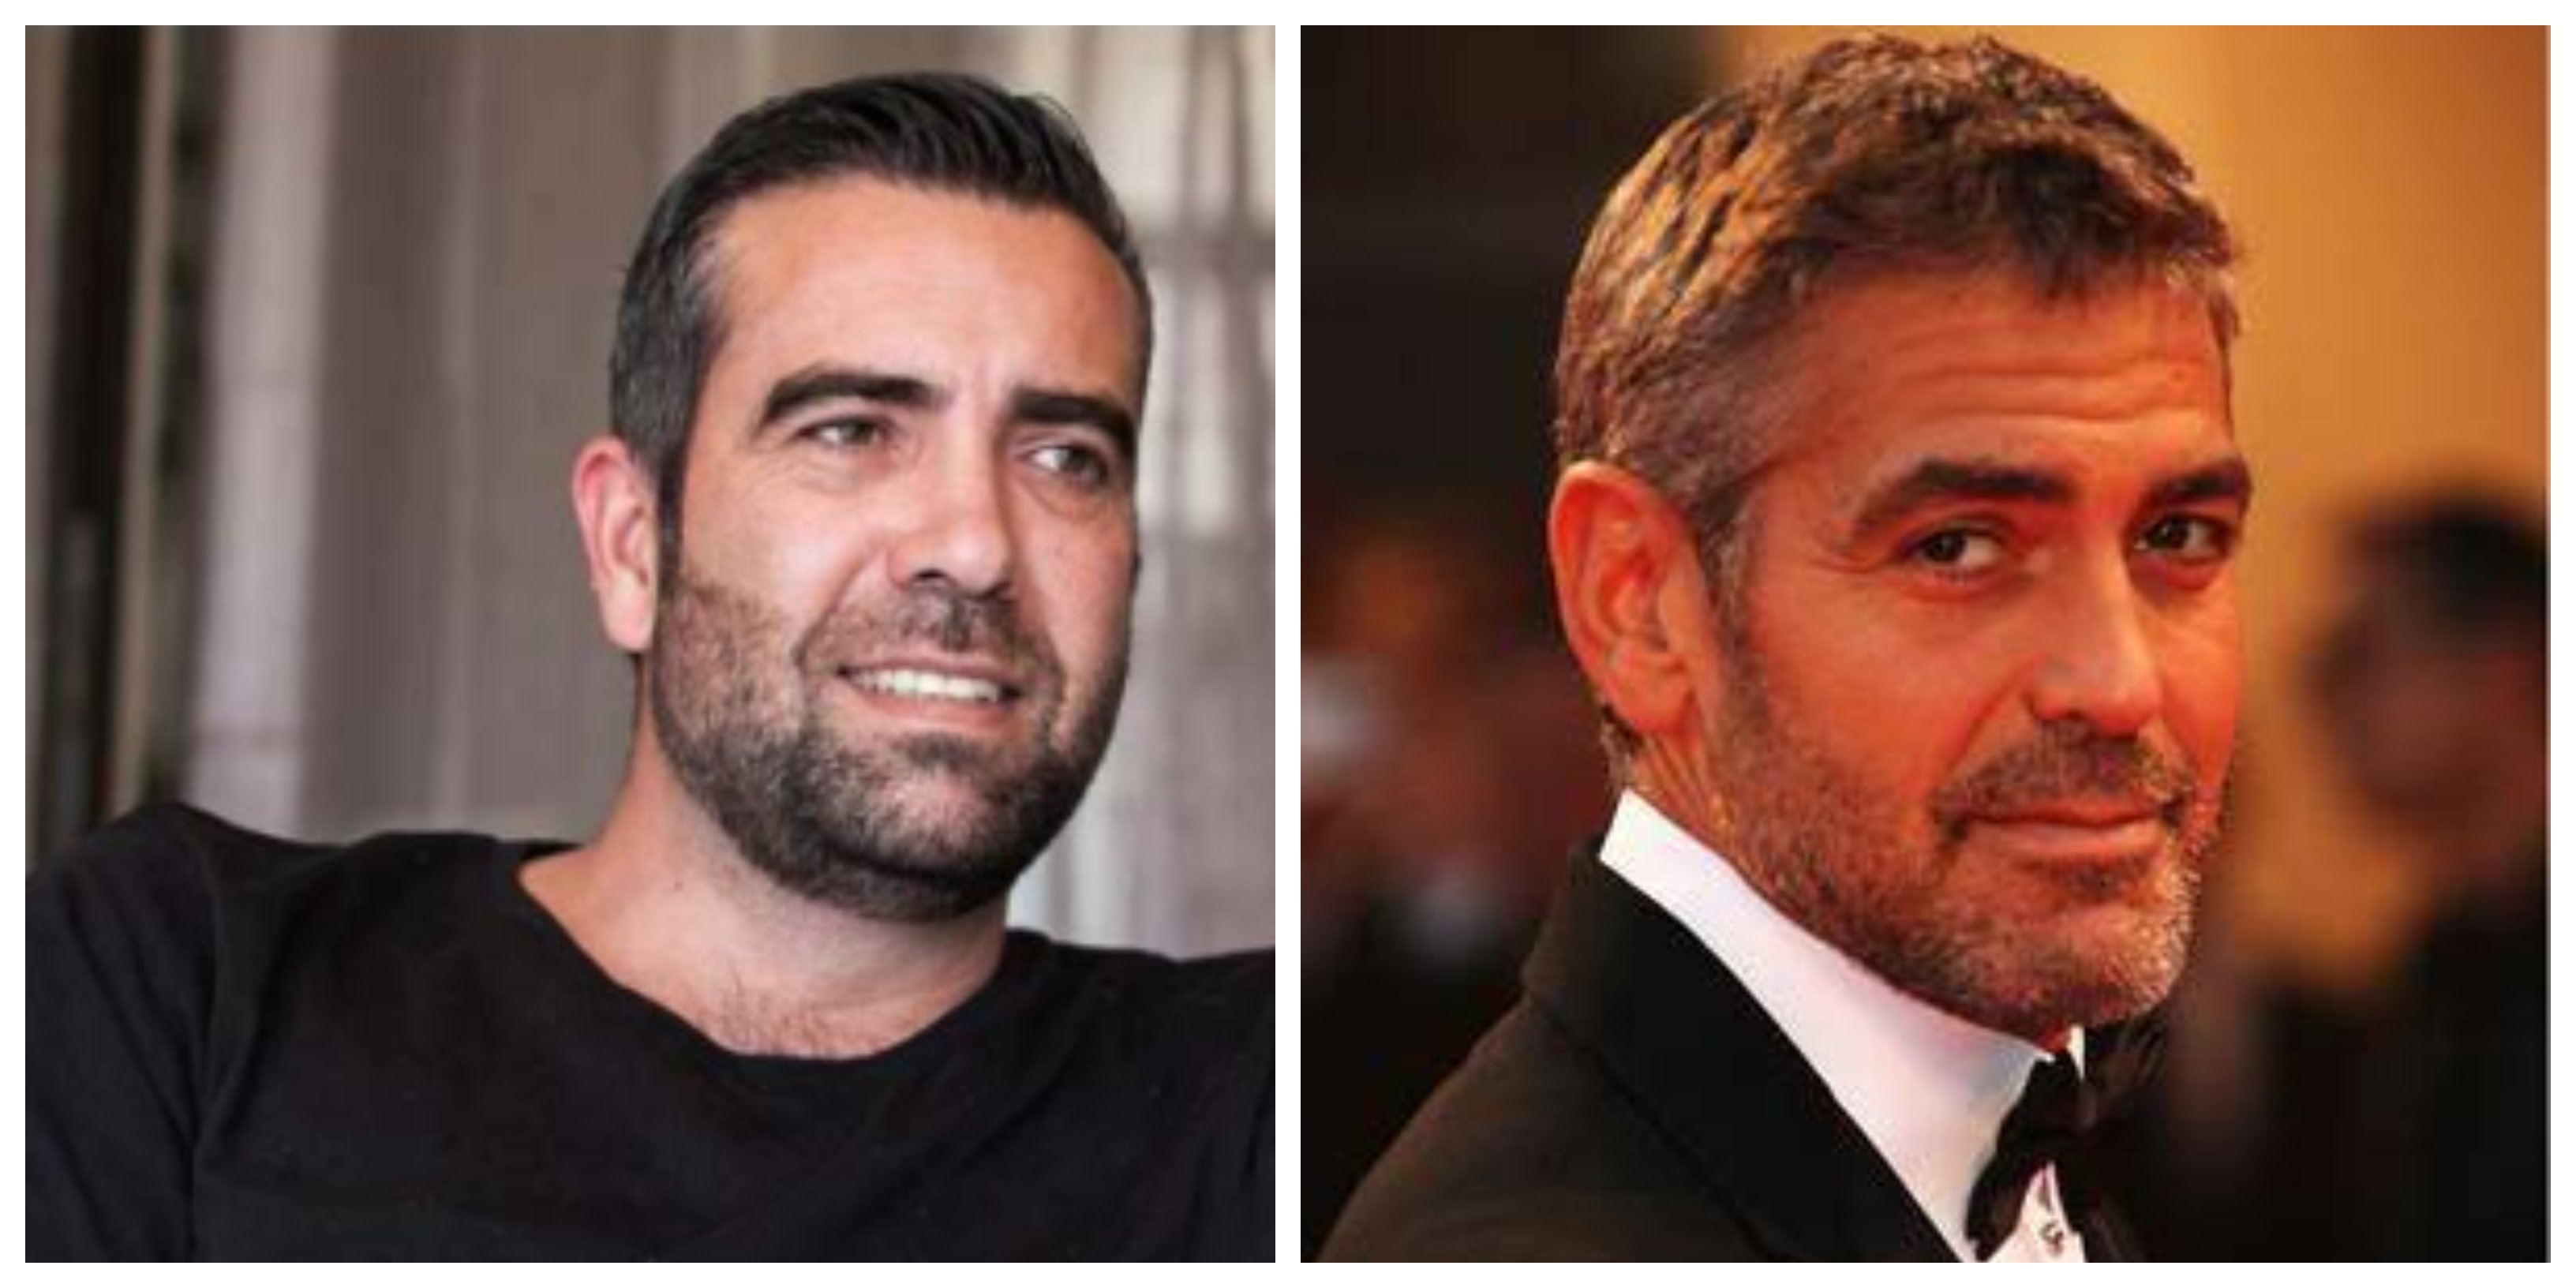 Jo Black / George Clooney 1